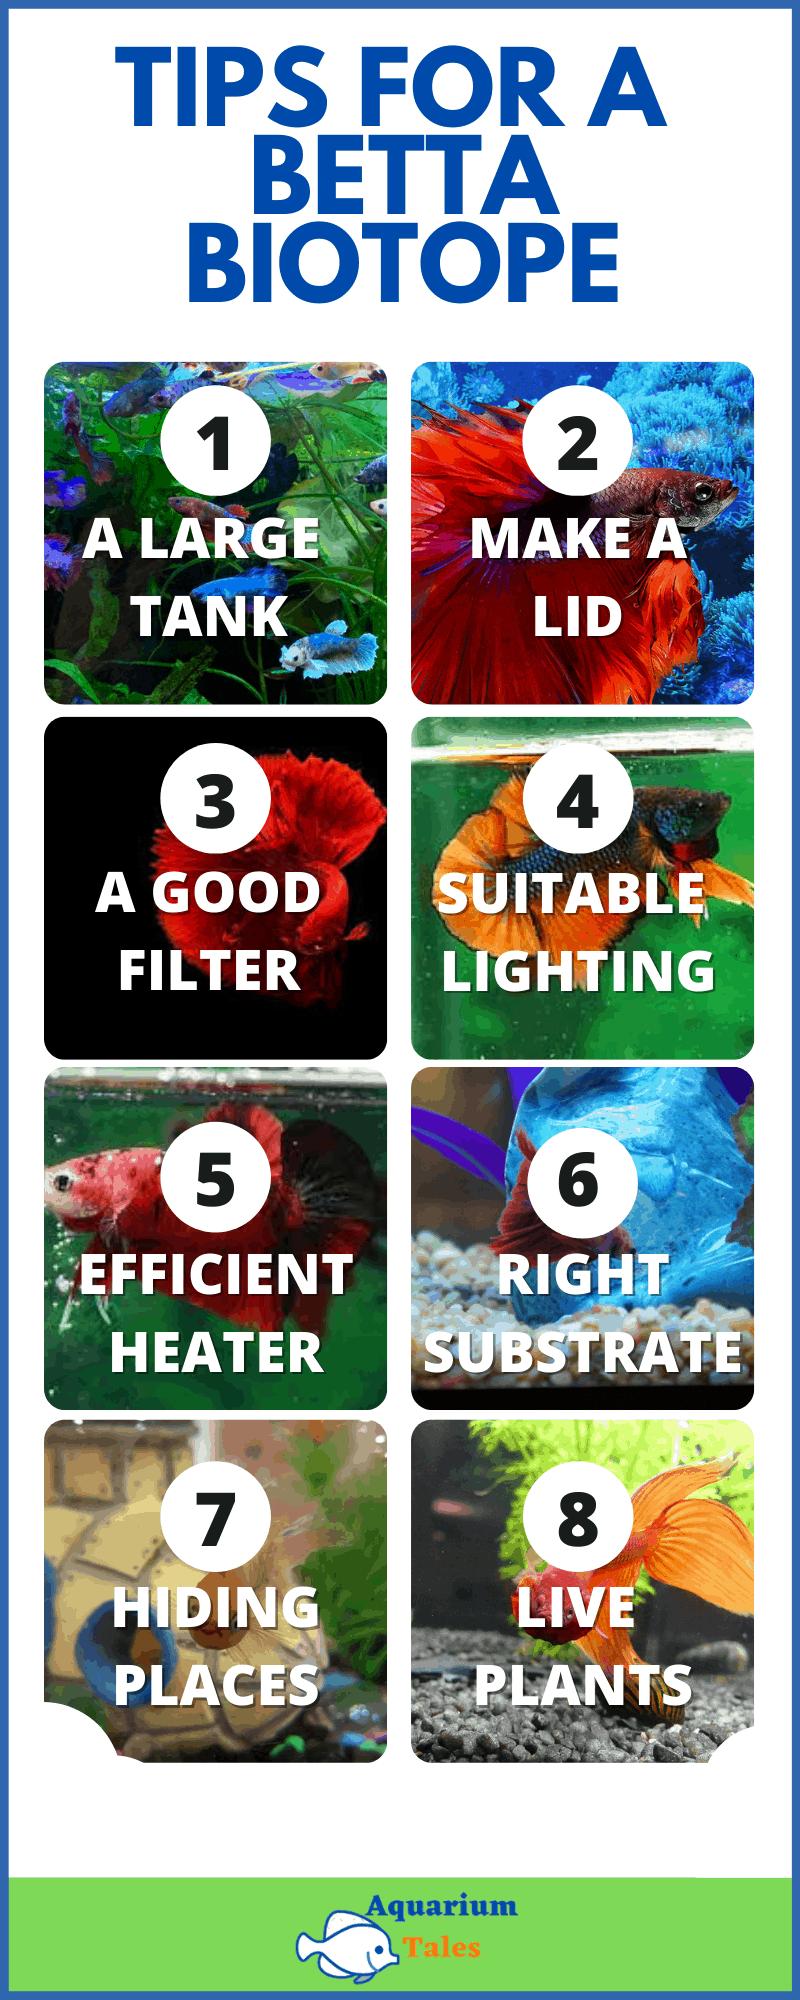 Betta biotope aquarium setup guide